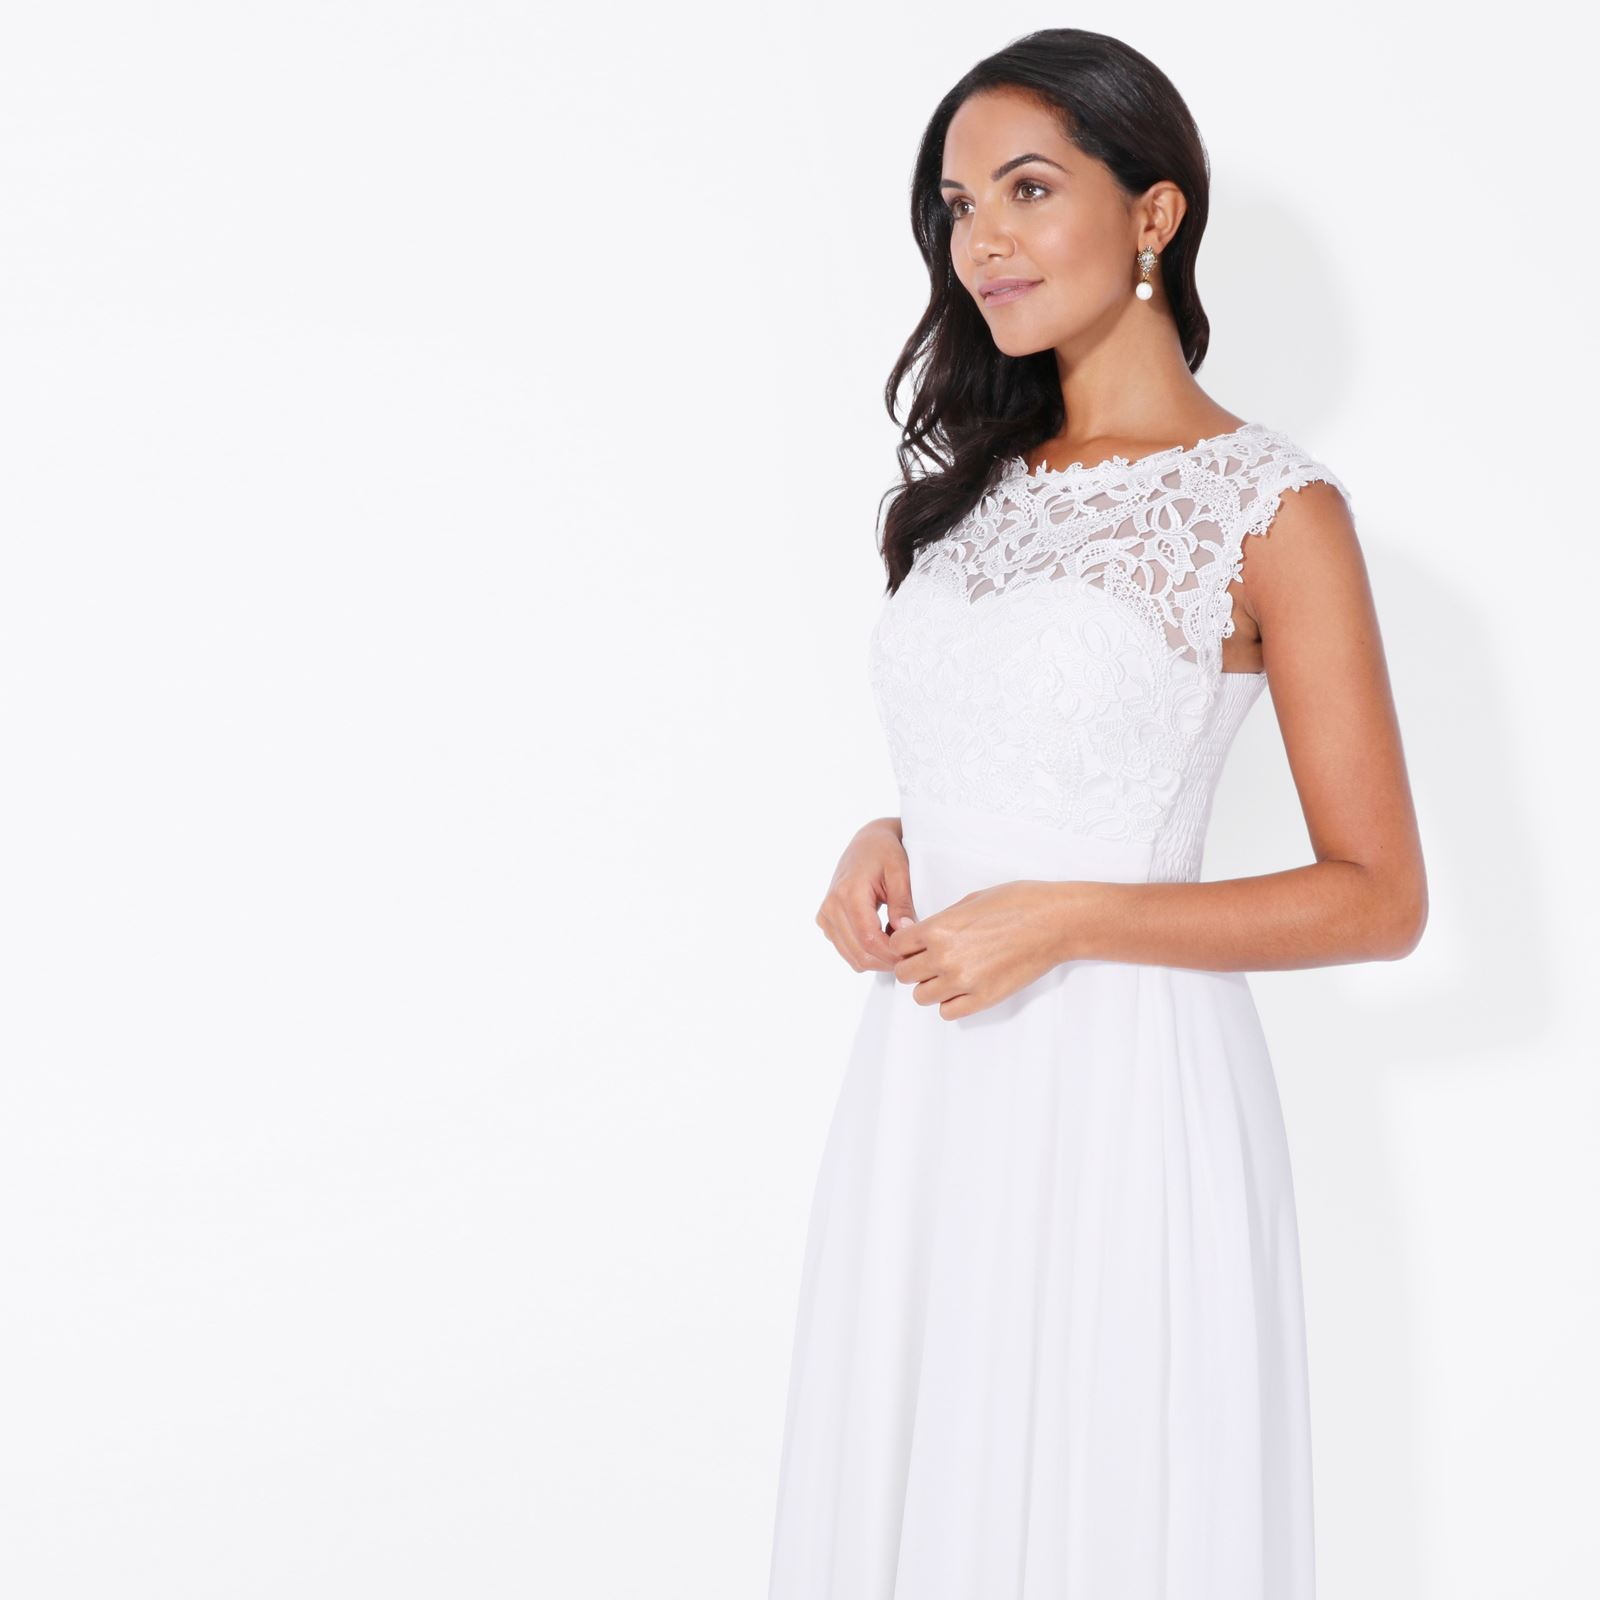 Womens-Wedding-Bridesmaid-Prom-Dress-Formal-One-Off-Shoulder-Long-Evening-8-18 thumbnail 75